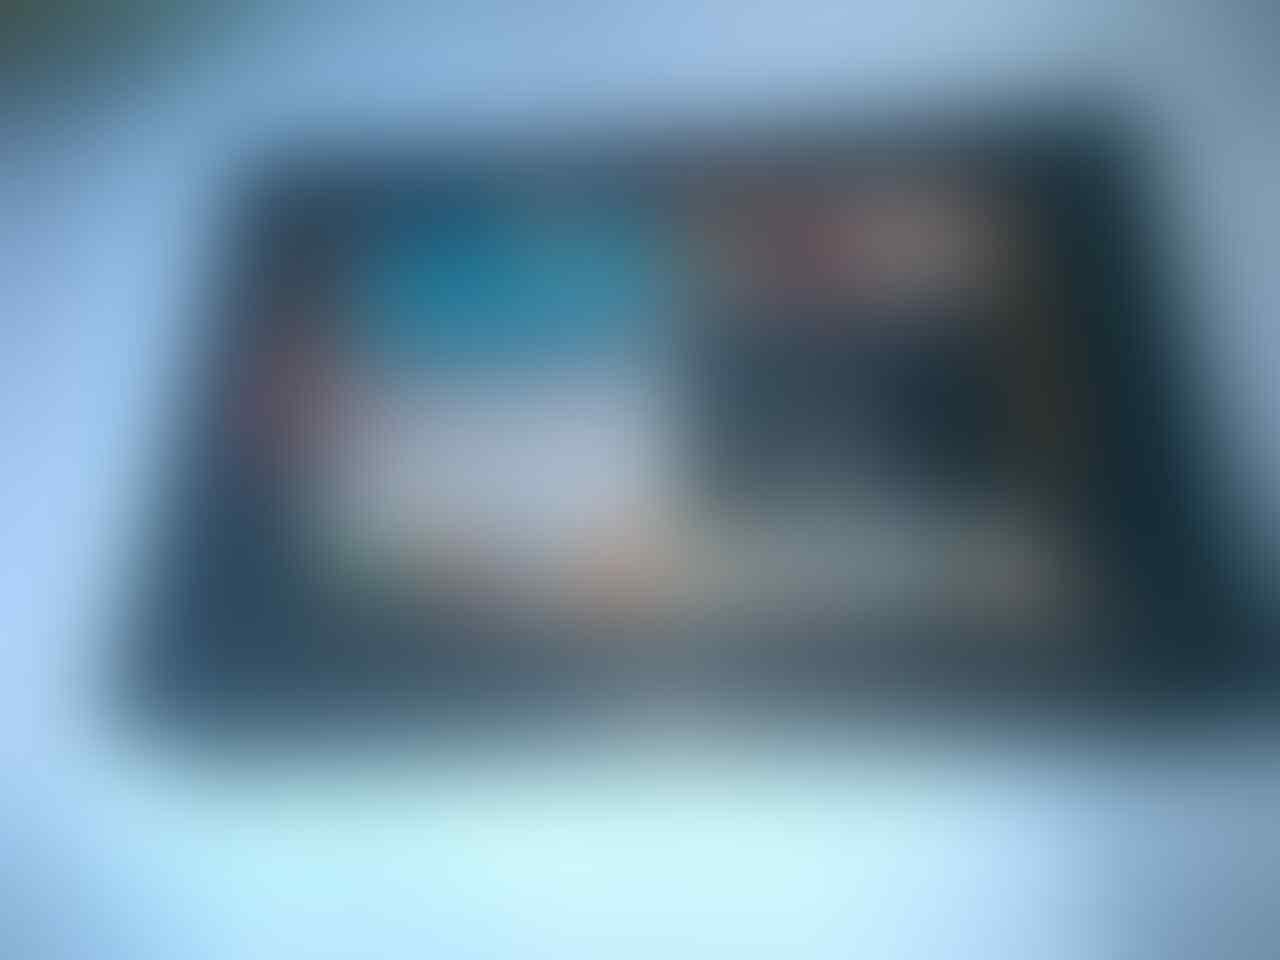 samsung tab 2 10.1inch GT P5100 black